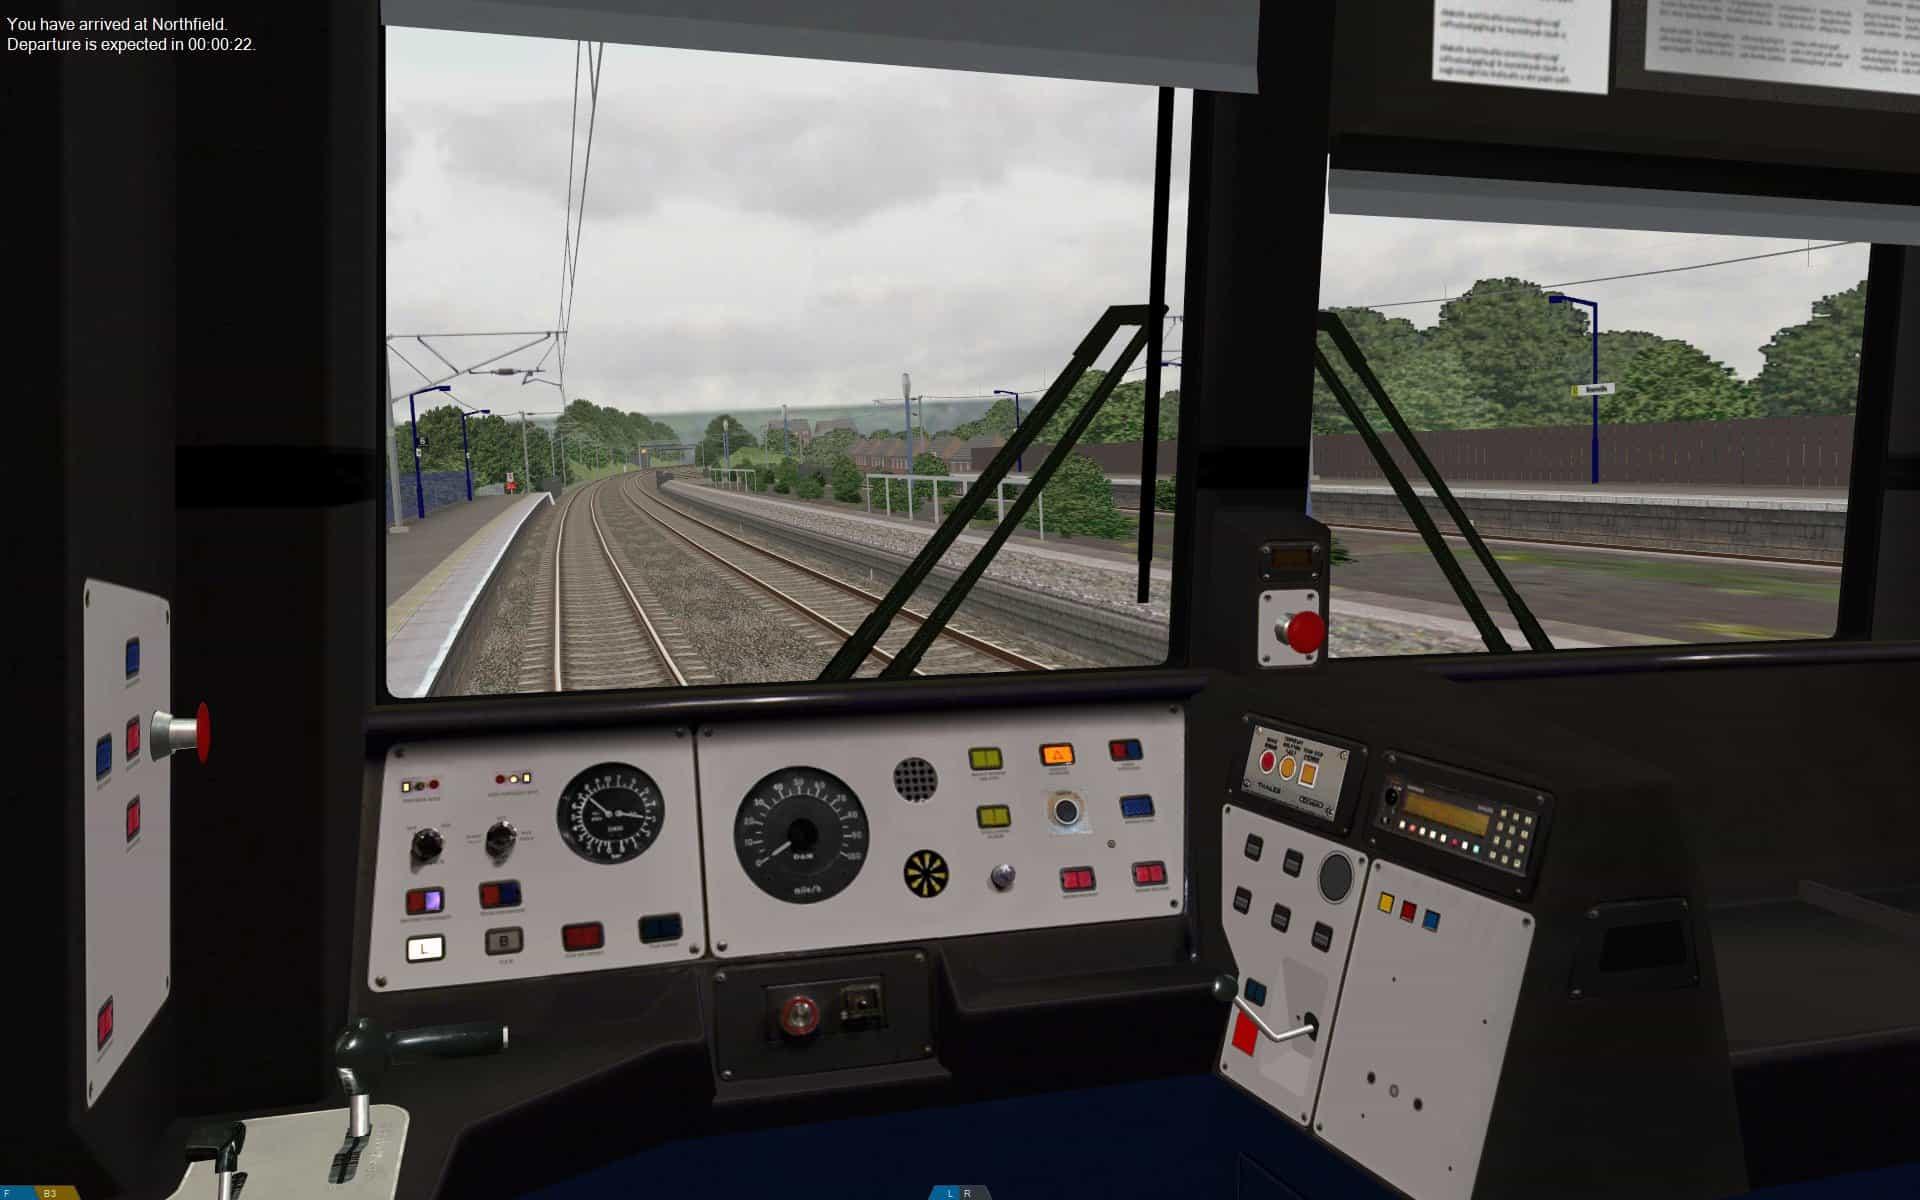 TrainSim bve5 train simulator game online - FOSS Games & Software